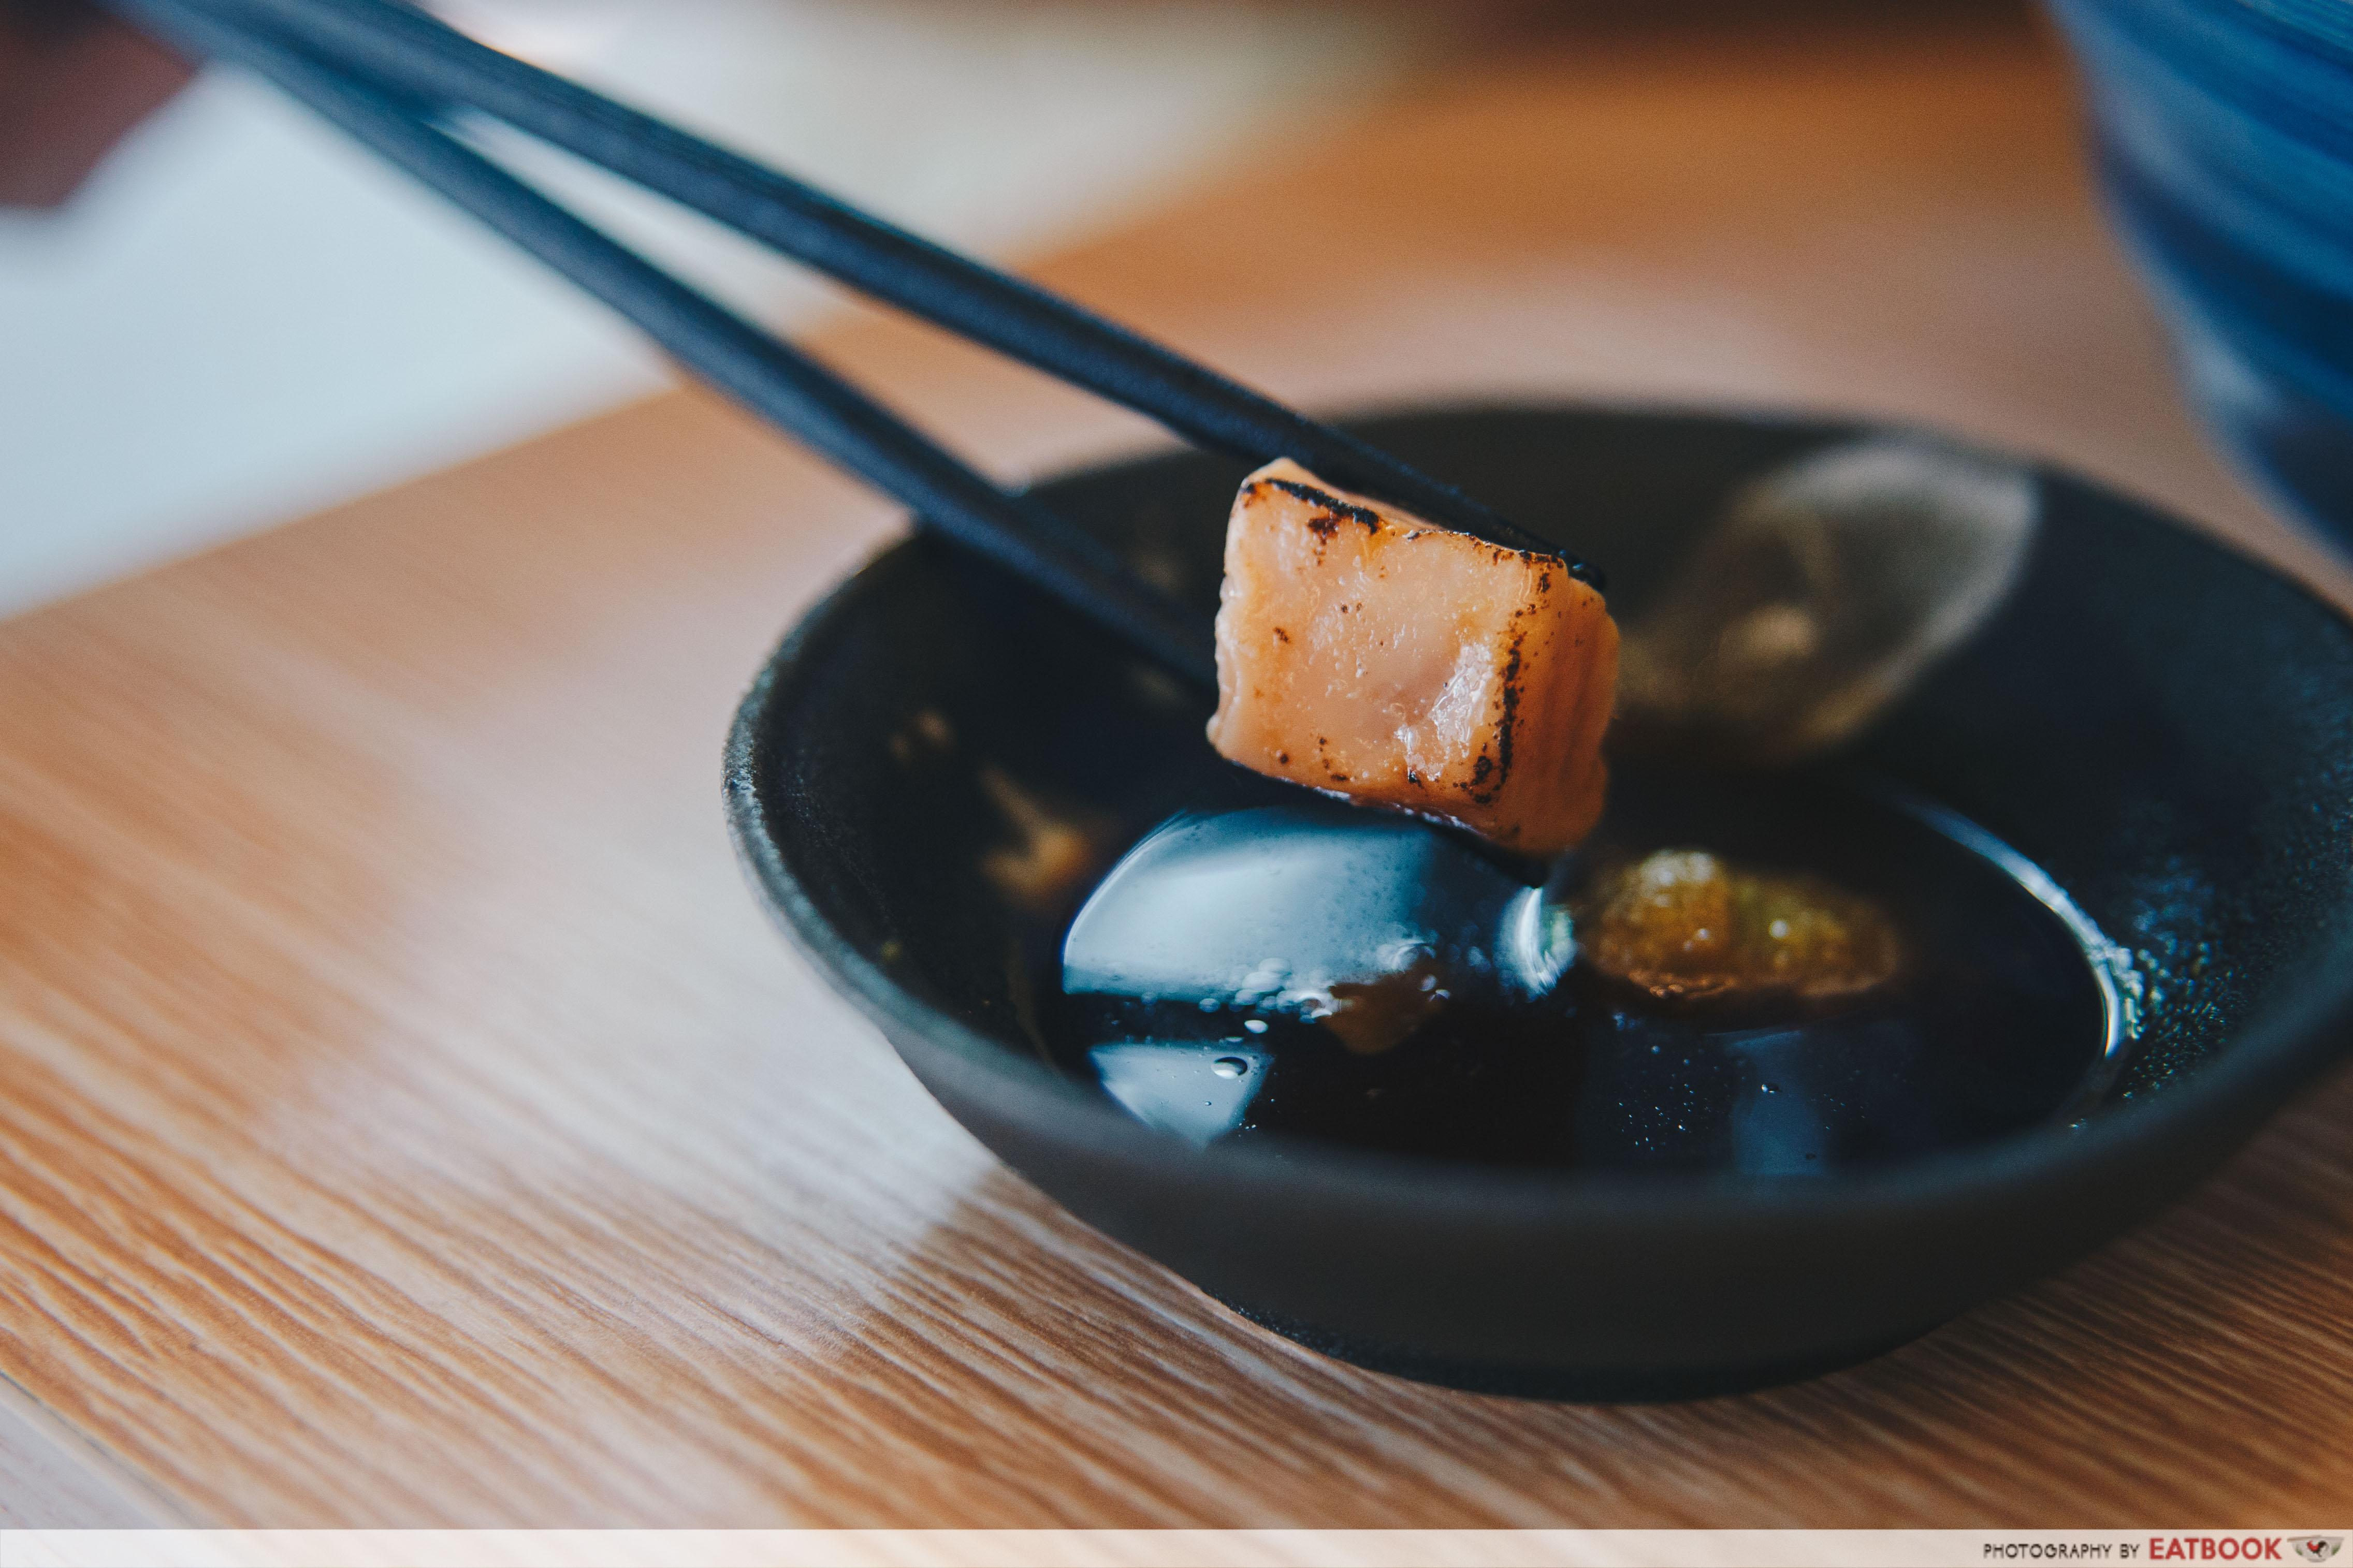 Umi Nami - Aburi Salmon Don Salmon Close Up